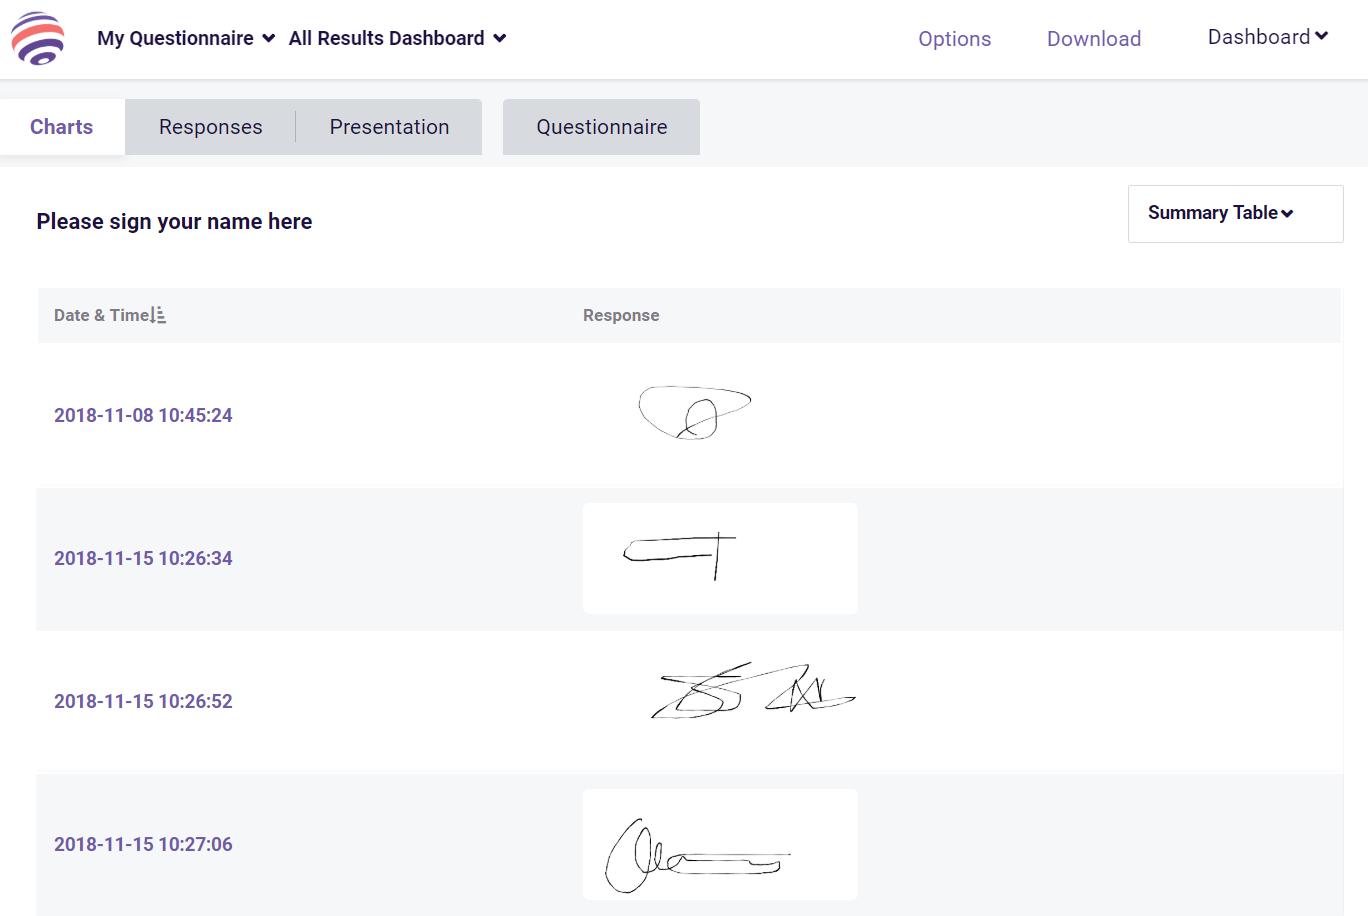 Signature results